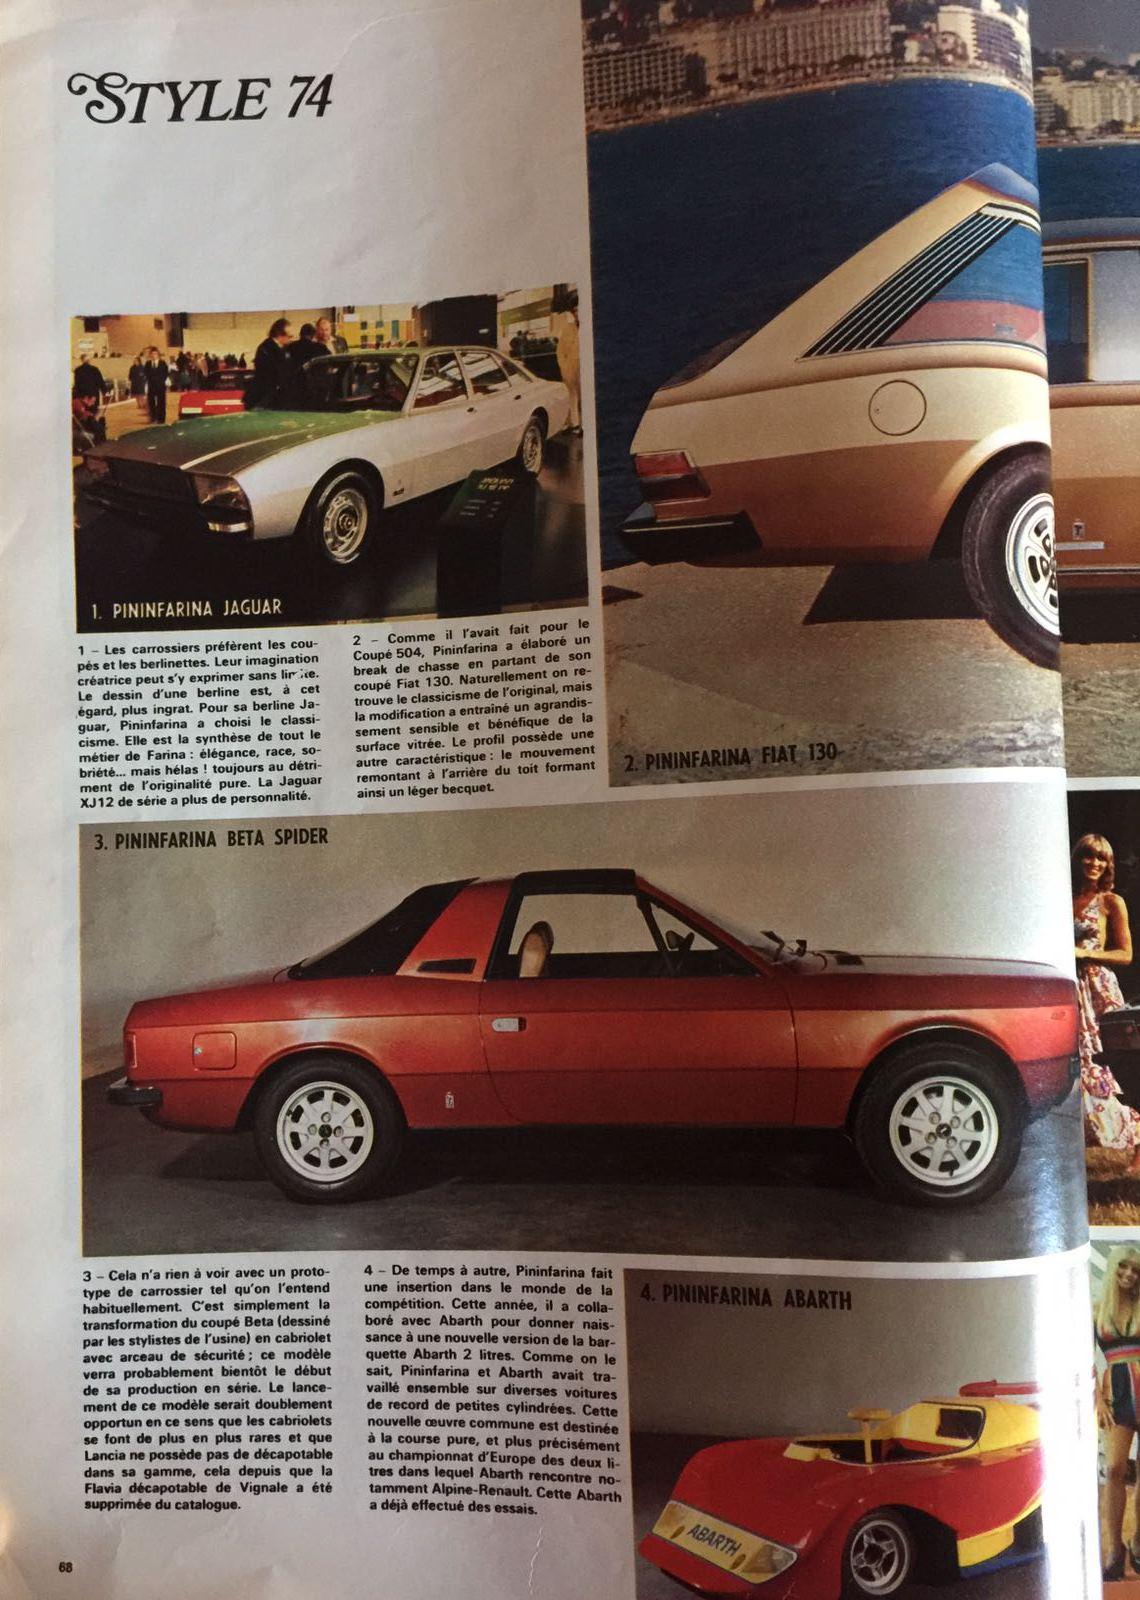 le salon de l auto essai de l auto journal 1974 de nederlandse fiat 130 website. Black Bedroom Furniture Sets. Home Design Ideas